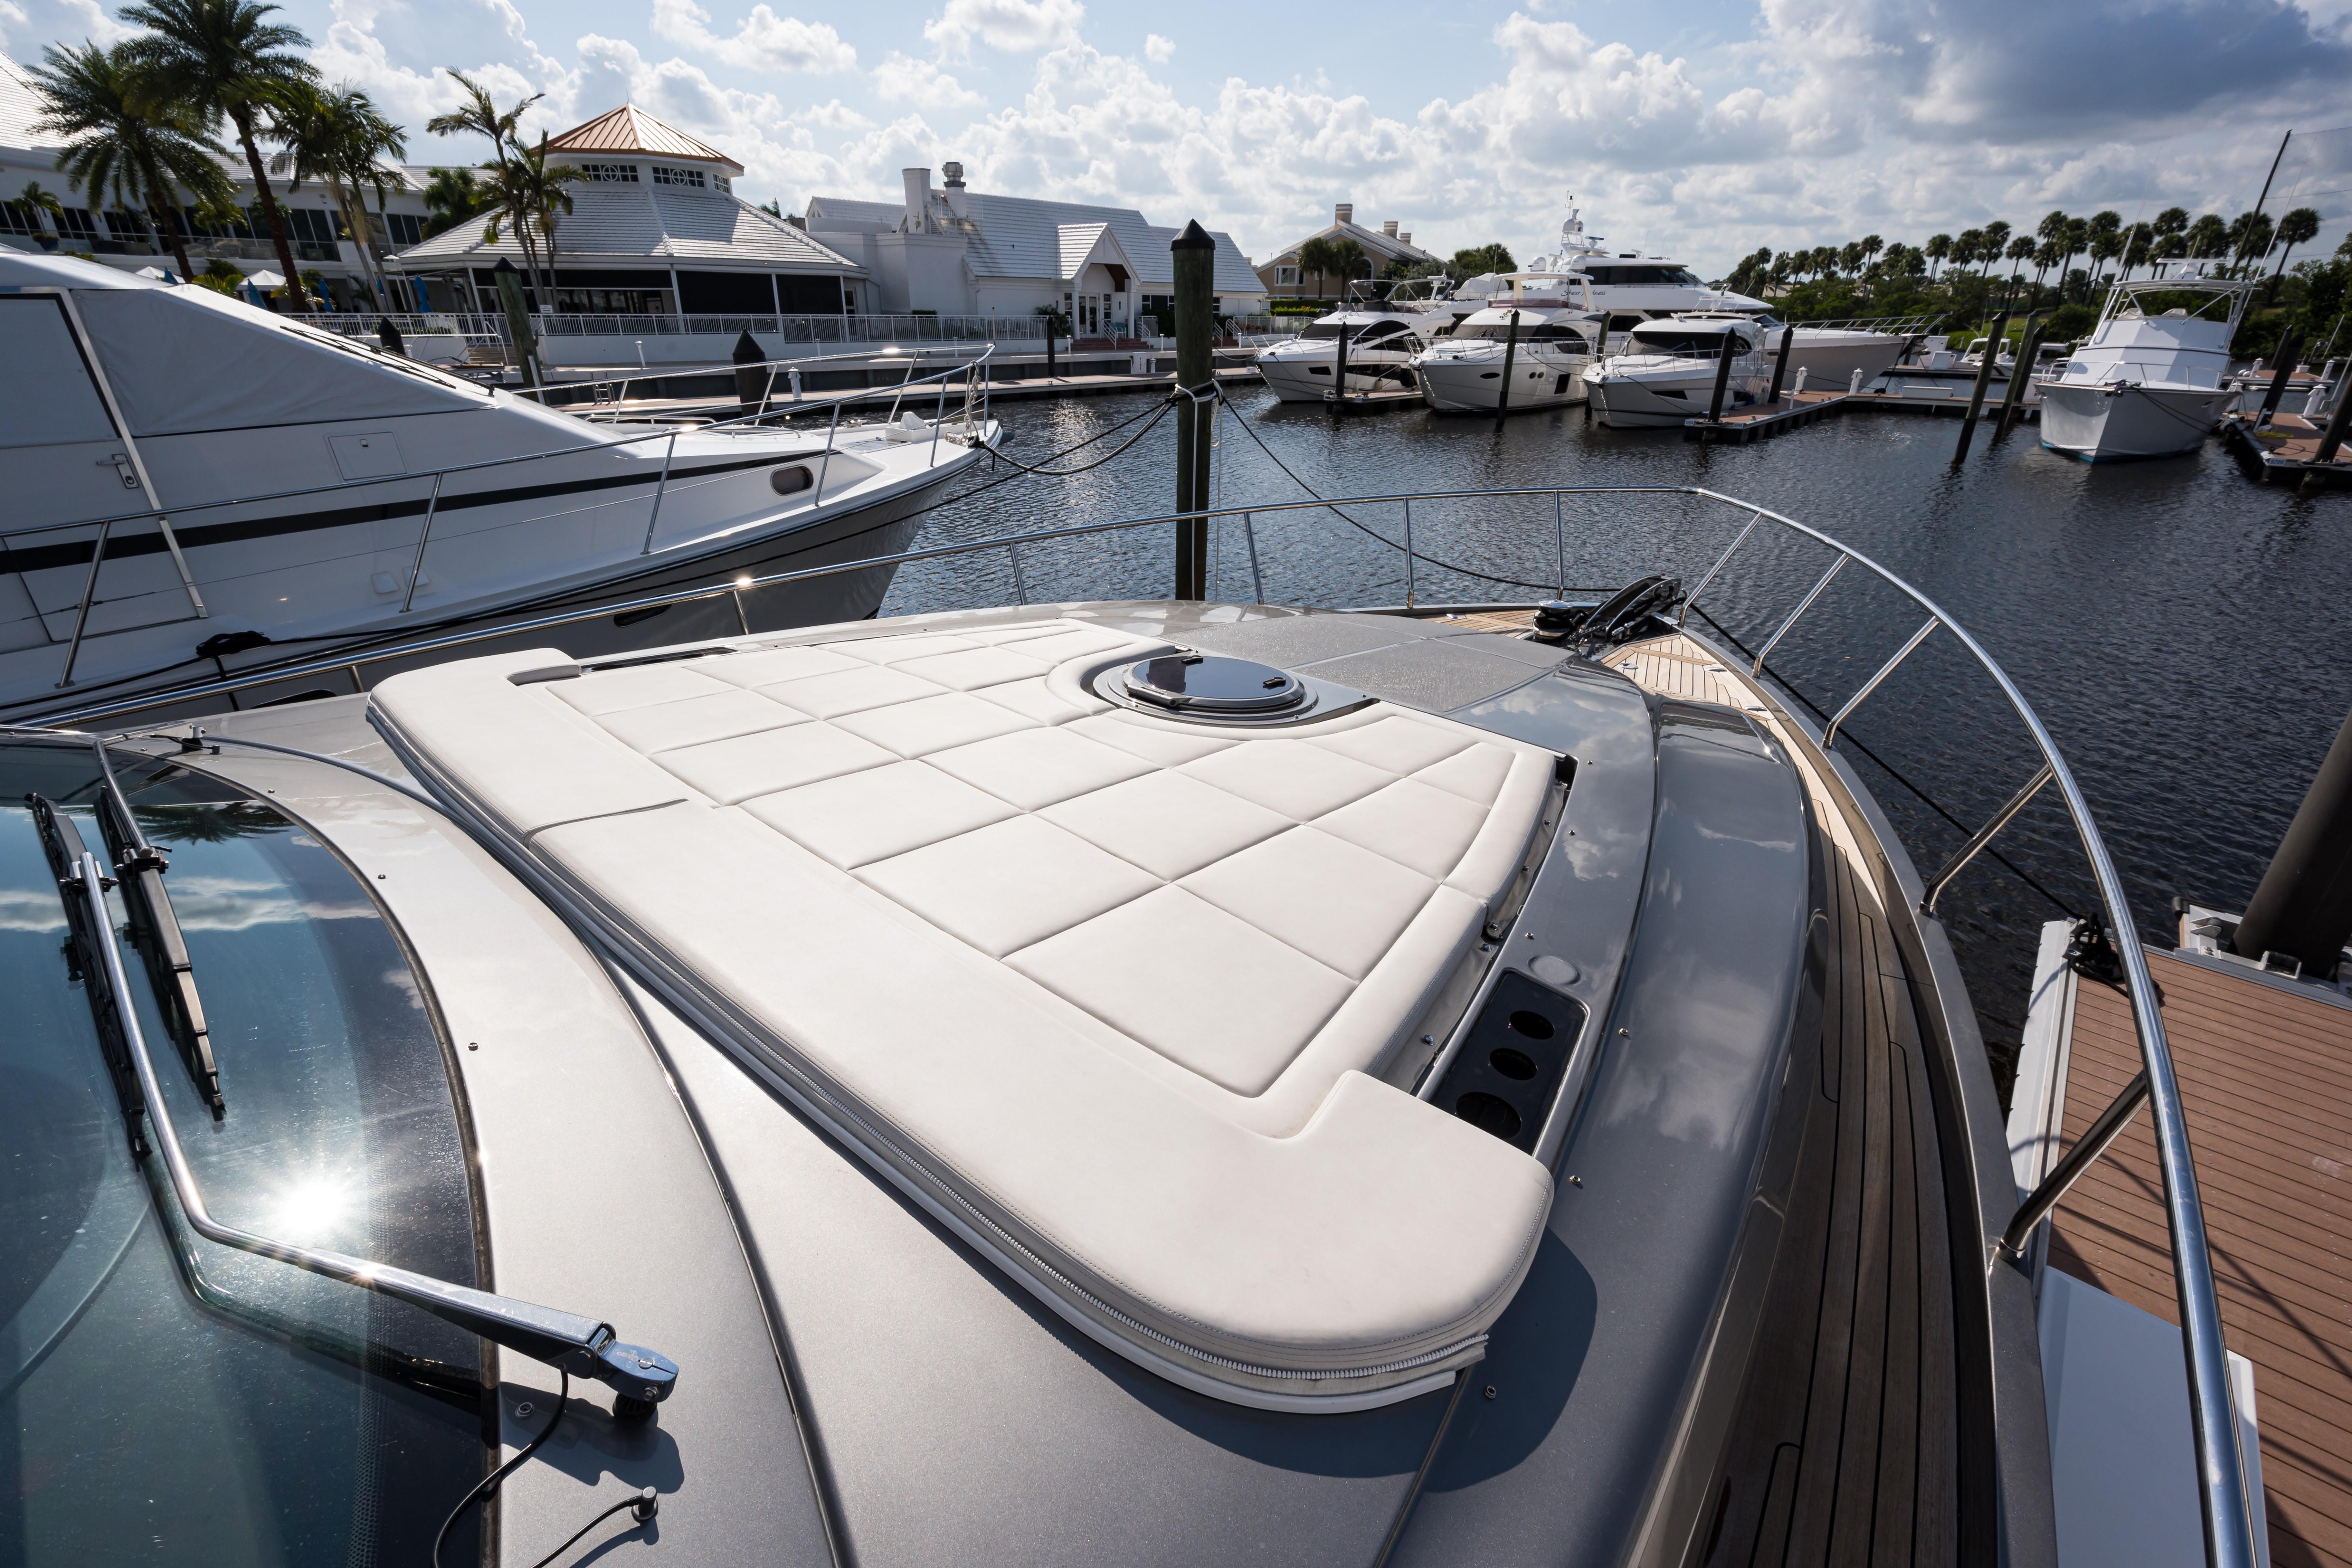 Sunshine, 62 Pershing 2014 Fore Deck Sunpads